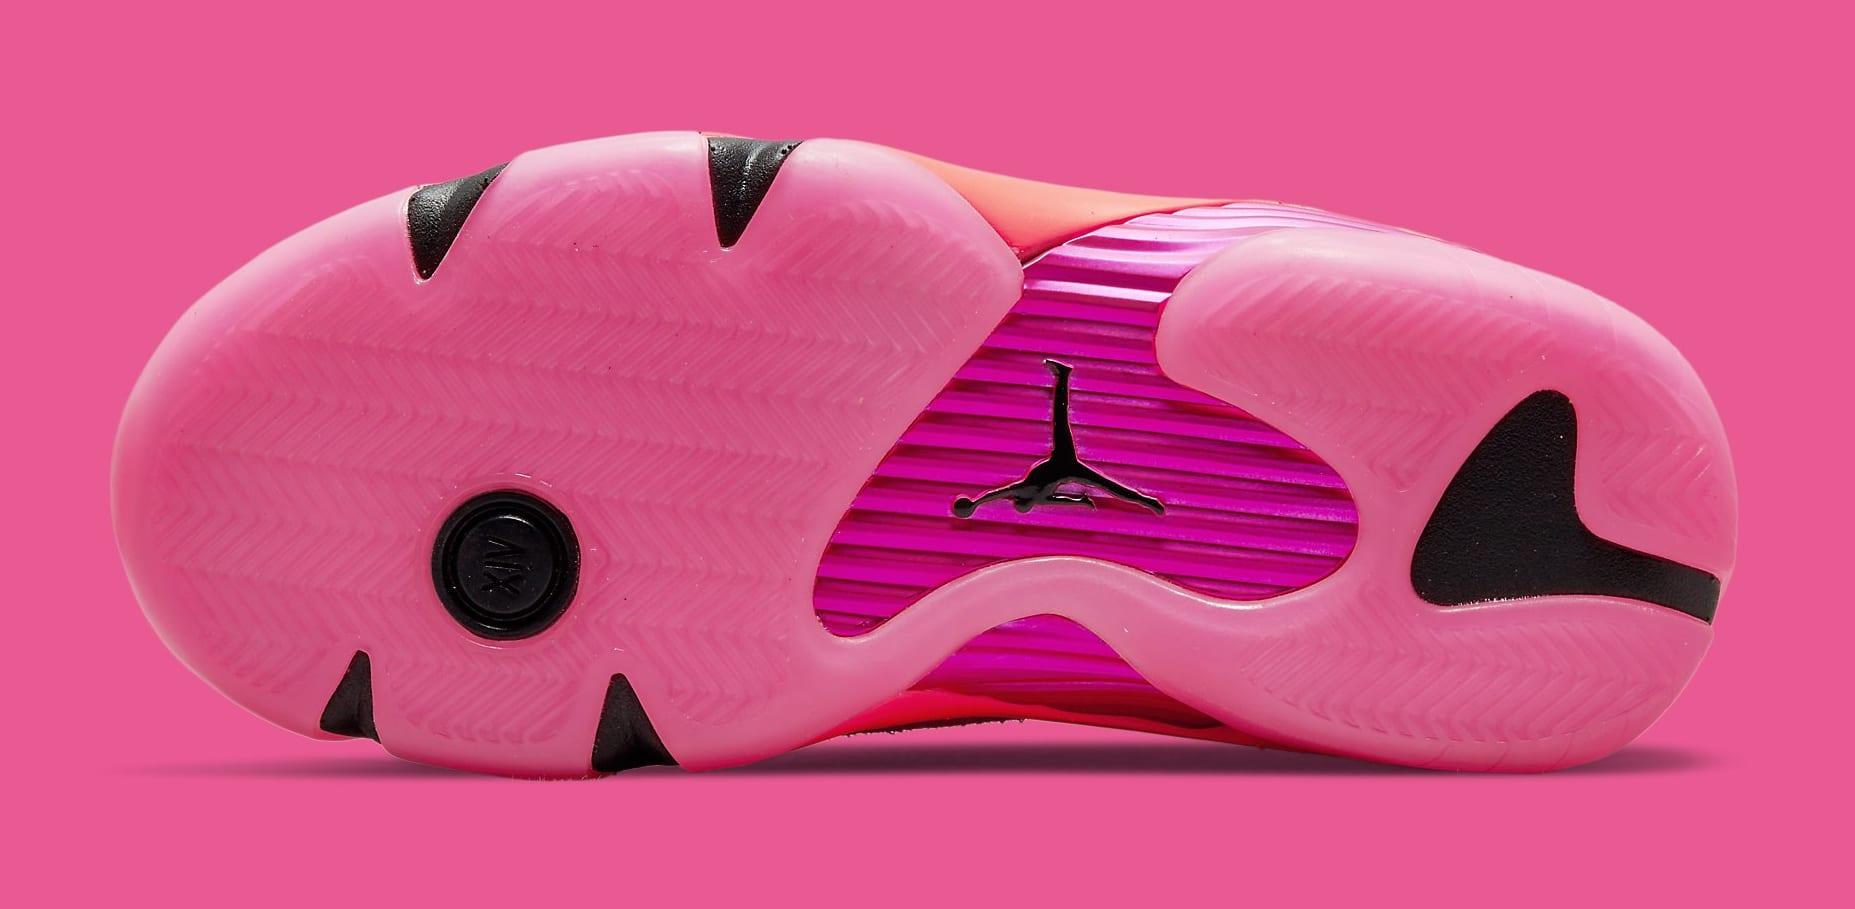 Air Jordan 14 Women's 'Shocking Pink' DH4121 600 Outsole